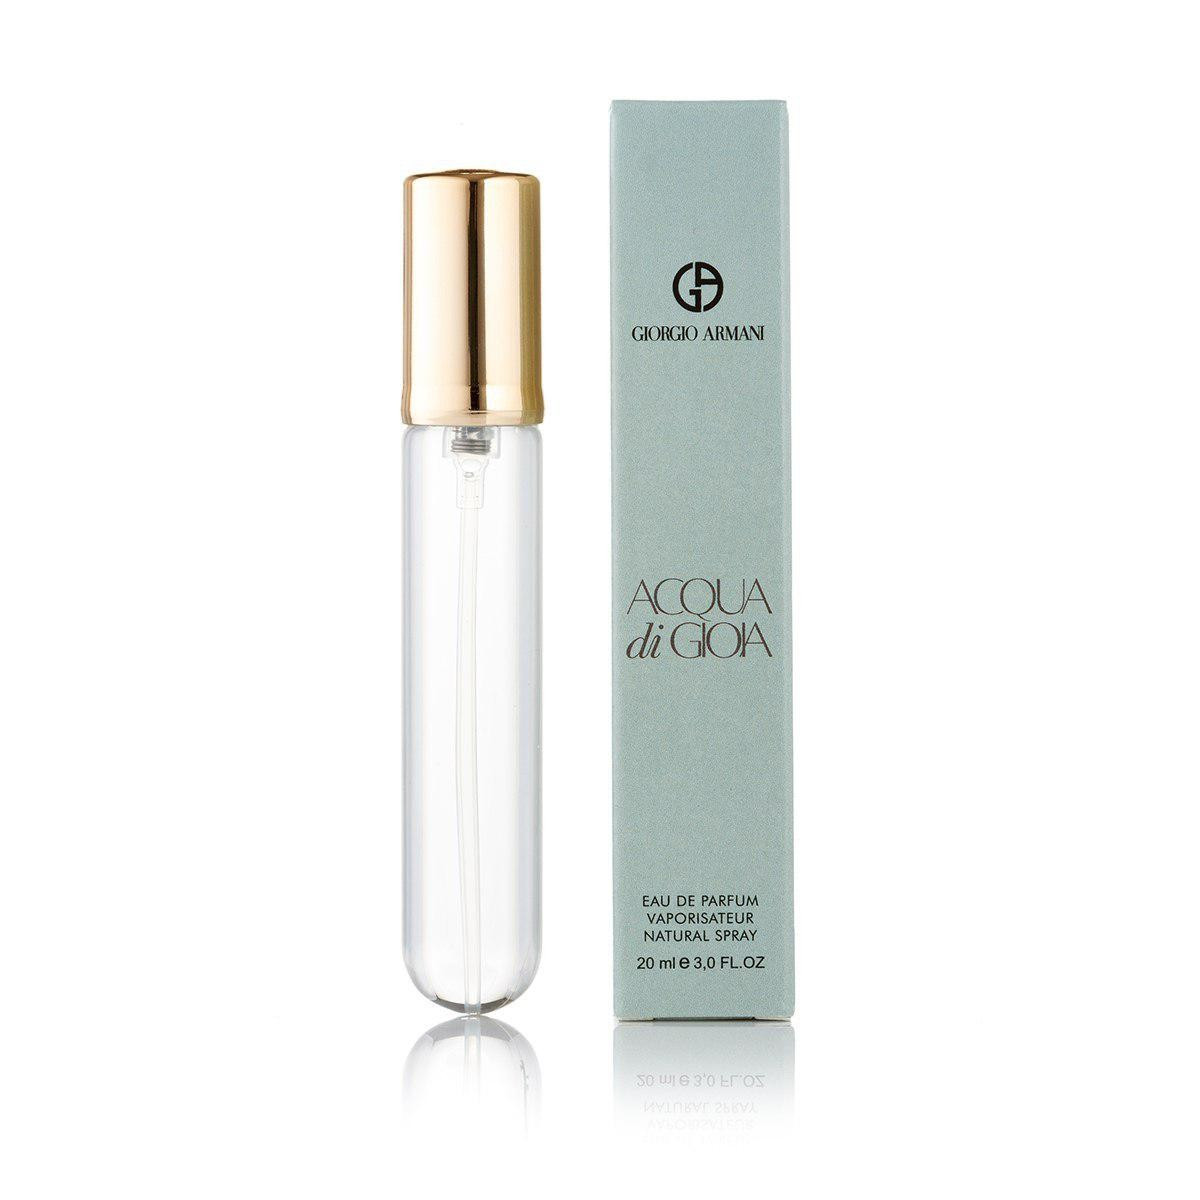 20 мл мини-парфюм Giorgio Armani Acqua Di Gioia (ж)